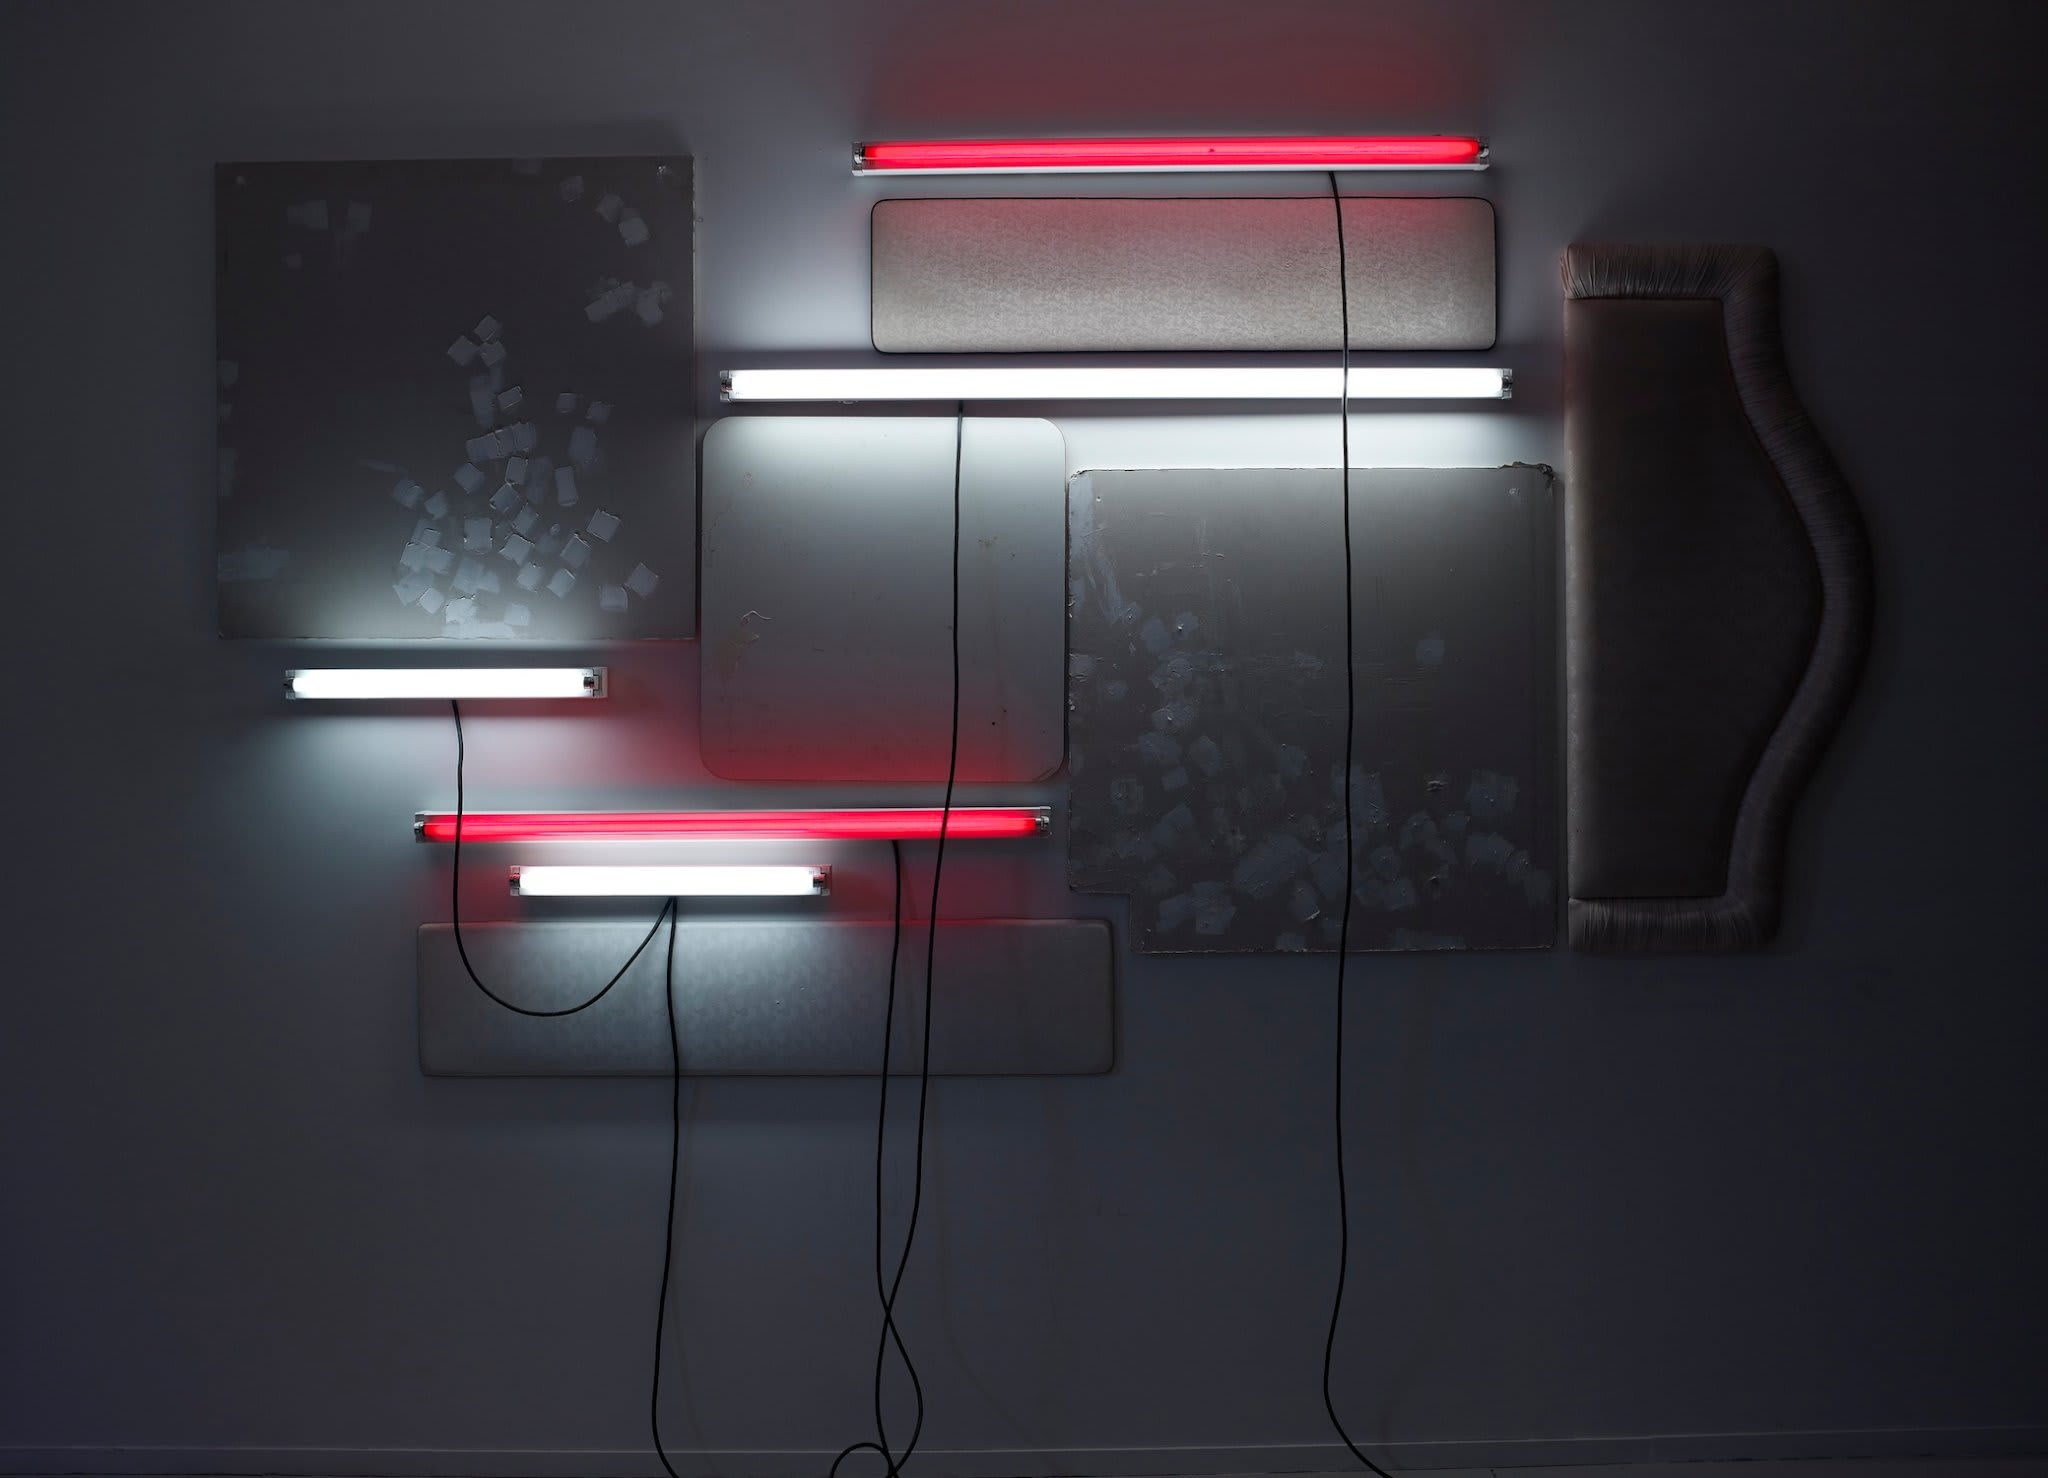 <span class=&#34;link fancybox-details-link&#34;><a href=&#34;/artists/16-paul-merrick/works/8118/&#34;>View Detail Page</a></span><div class=&#34;artist&#34;><strong>Paul Merrick</strong></div> <div class=&#34;title&#34;><em>Untitled (Hotel/Motel)</em>, 2013</div> <div class=&#34;medium&#34;>Plasterboard, filler, melamine, florescent strip lights, head-boards, flex</div> <div class=&#34;dimensions&#34;>320 x 270 cm<br />126 x 106 1/4 in</div><div class=&#34;copyright_line&#34;>Copyright The Artist</div>